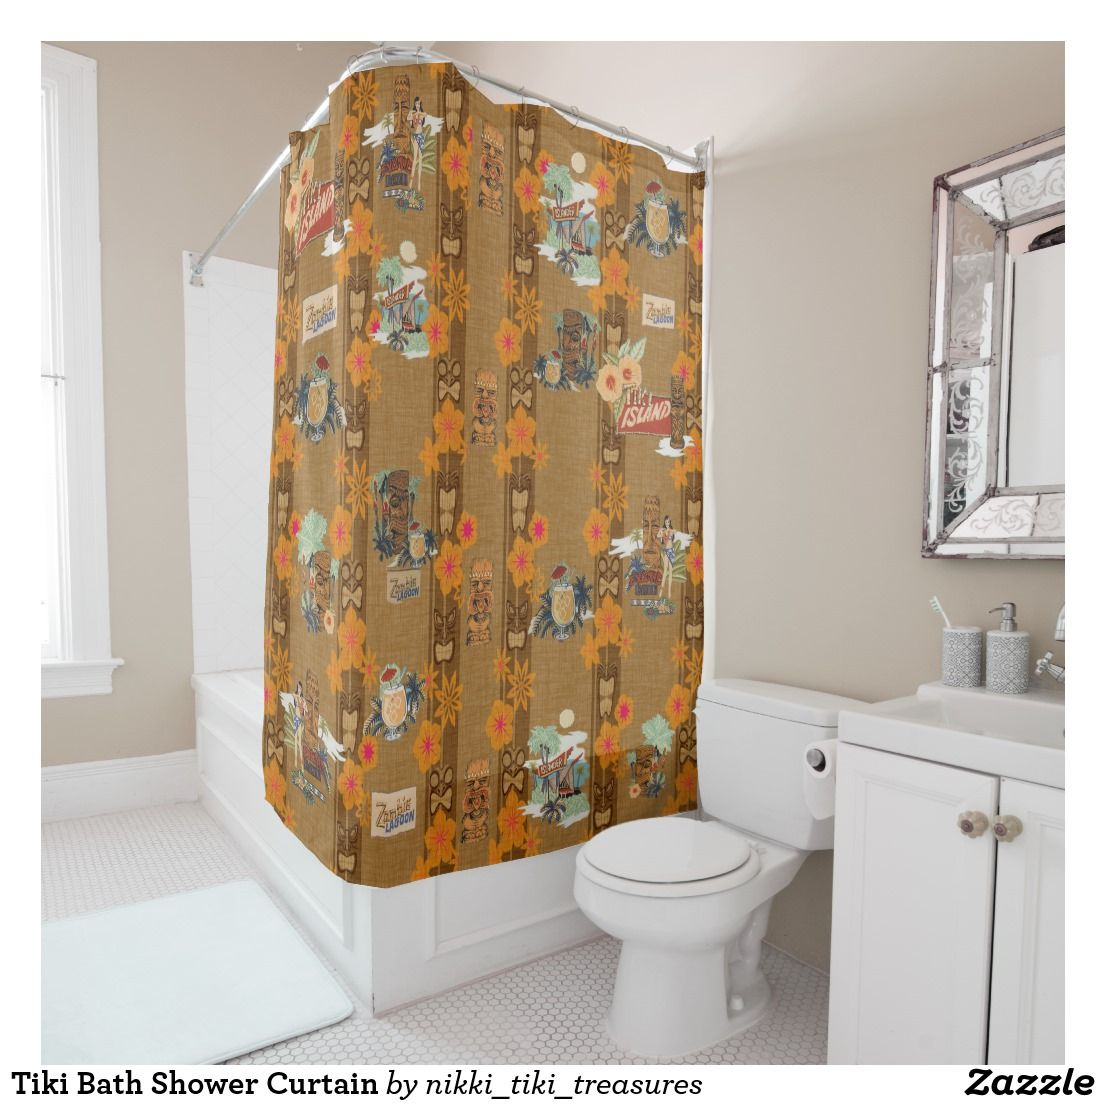 Tiki Bath Shower Curtain | Bath:Shower Curtains | Pinterest | Bath ...